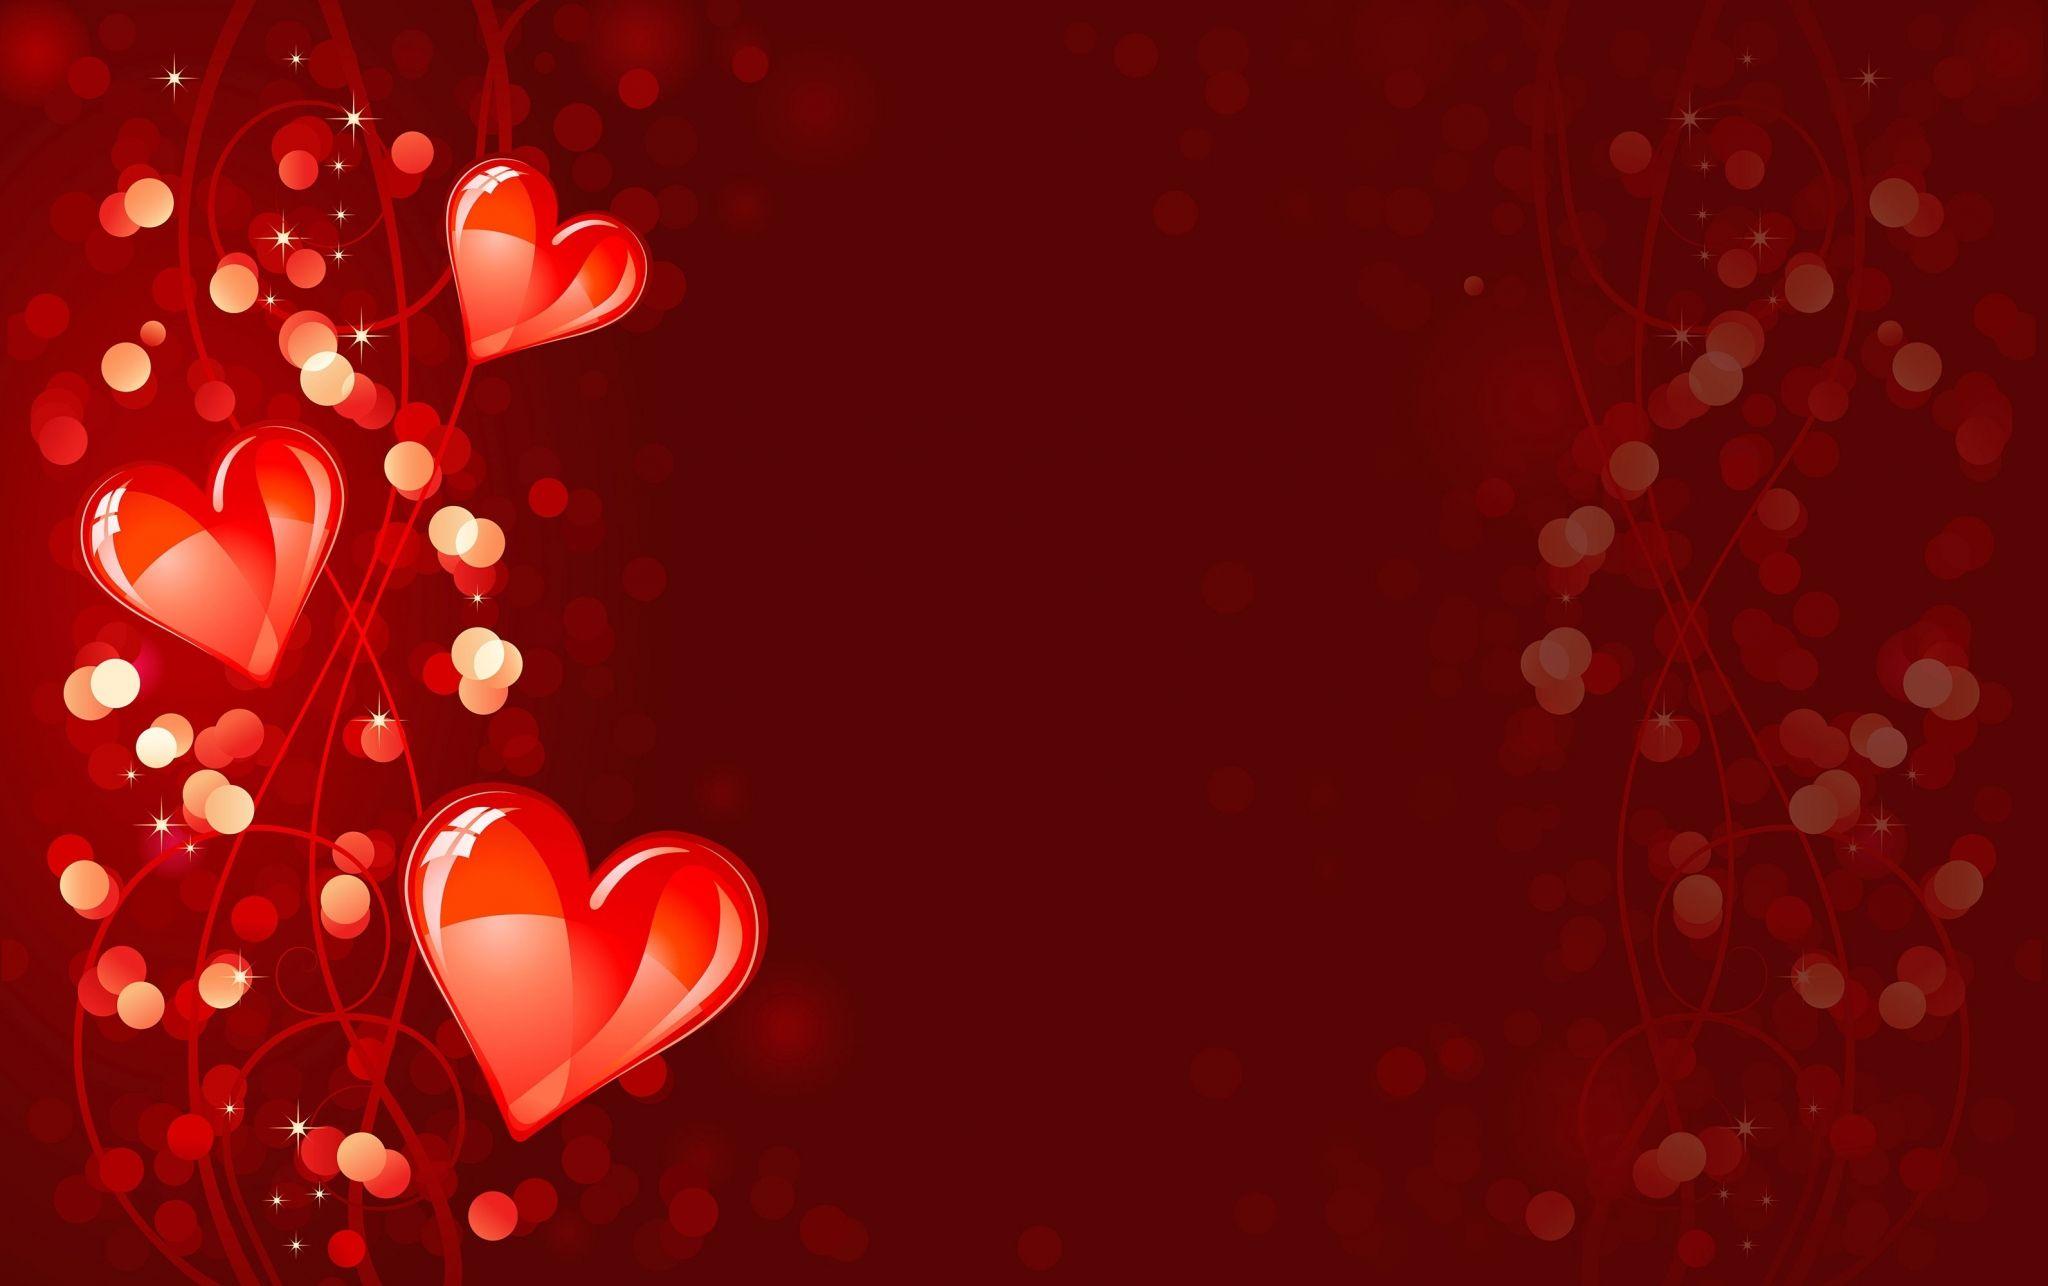 valentines day wallpaper pack 1080p hd Valentines day background 2048x1286